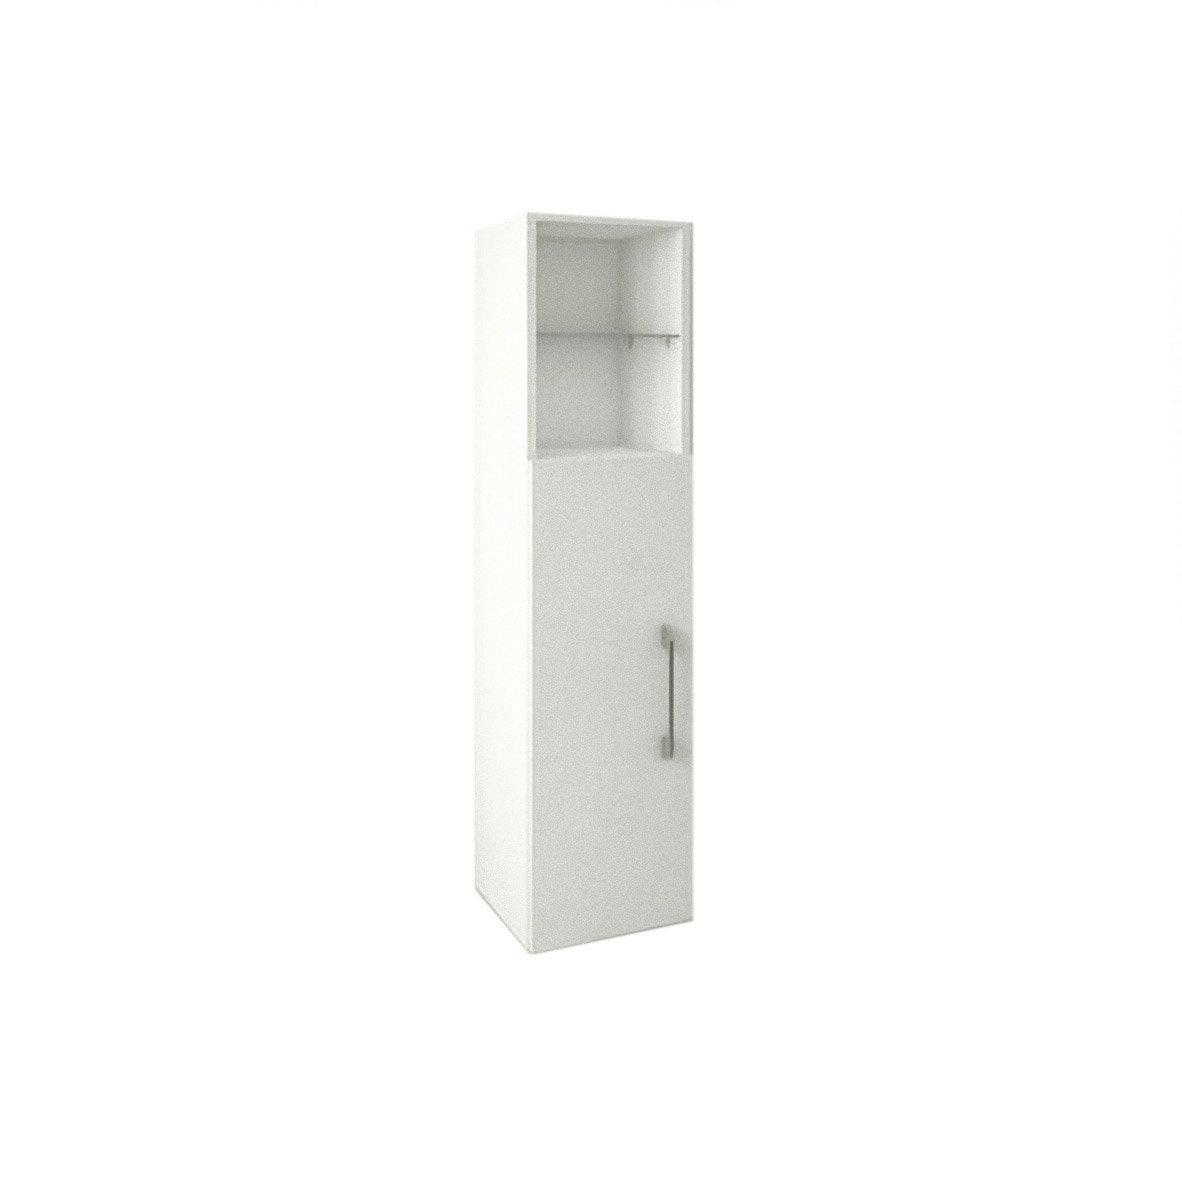 colonne 1 porte 1 niche happy blanc blanc n 0 leroy merlin. Black Bedroom Furniture Sets. Home Design Ideas